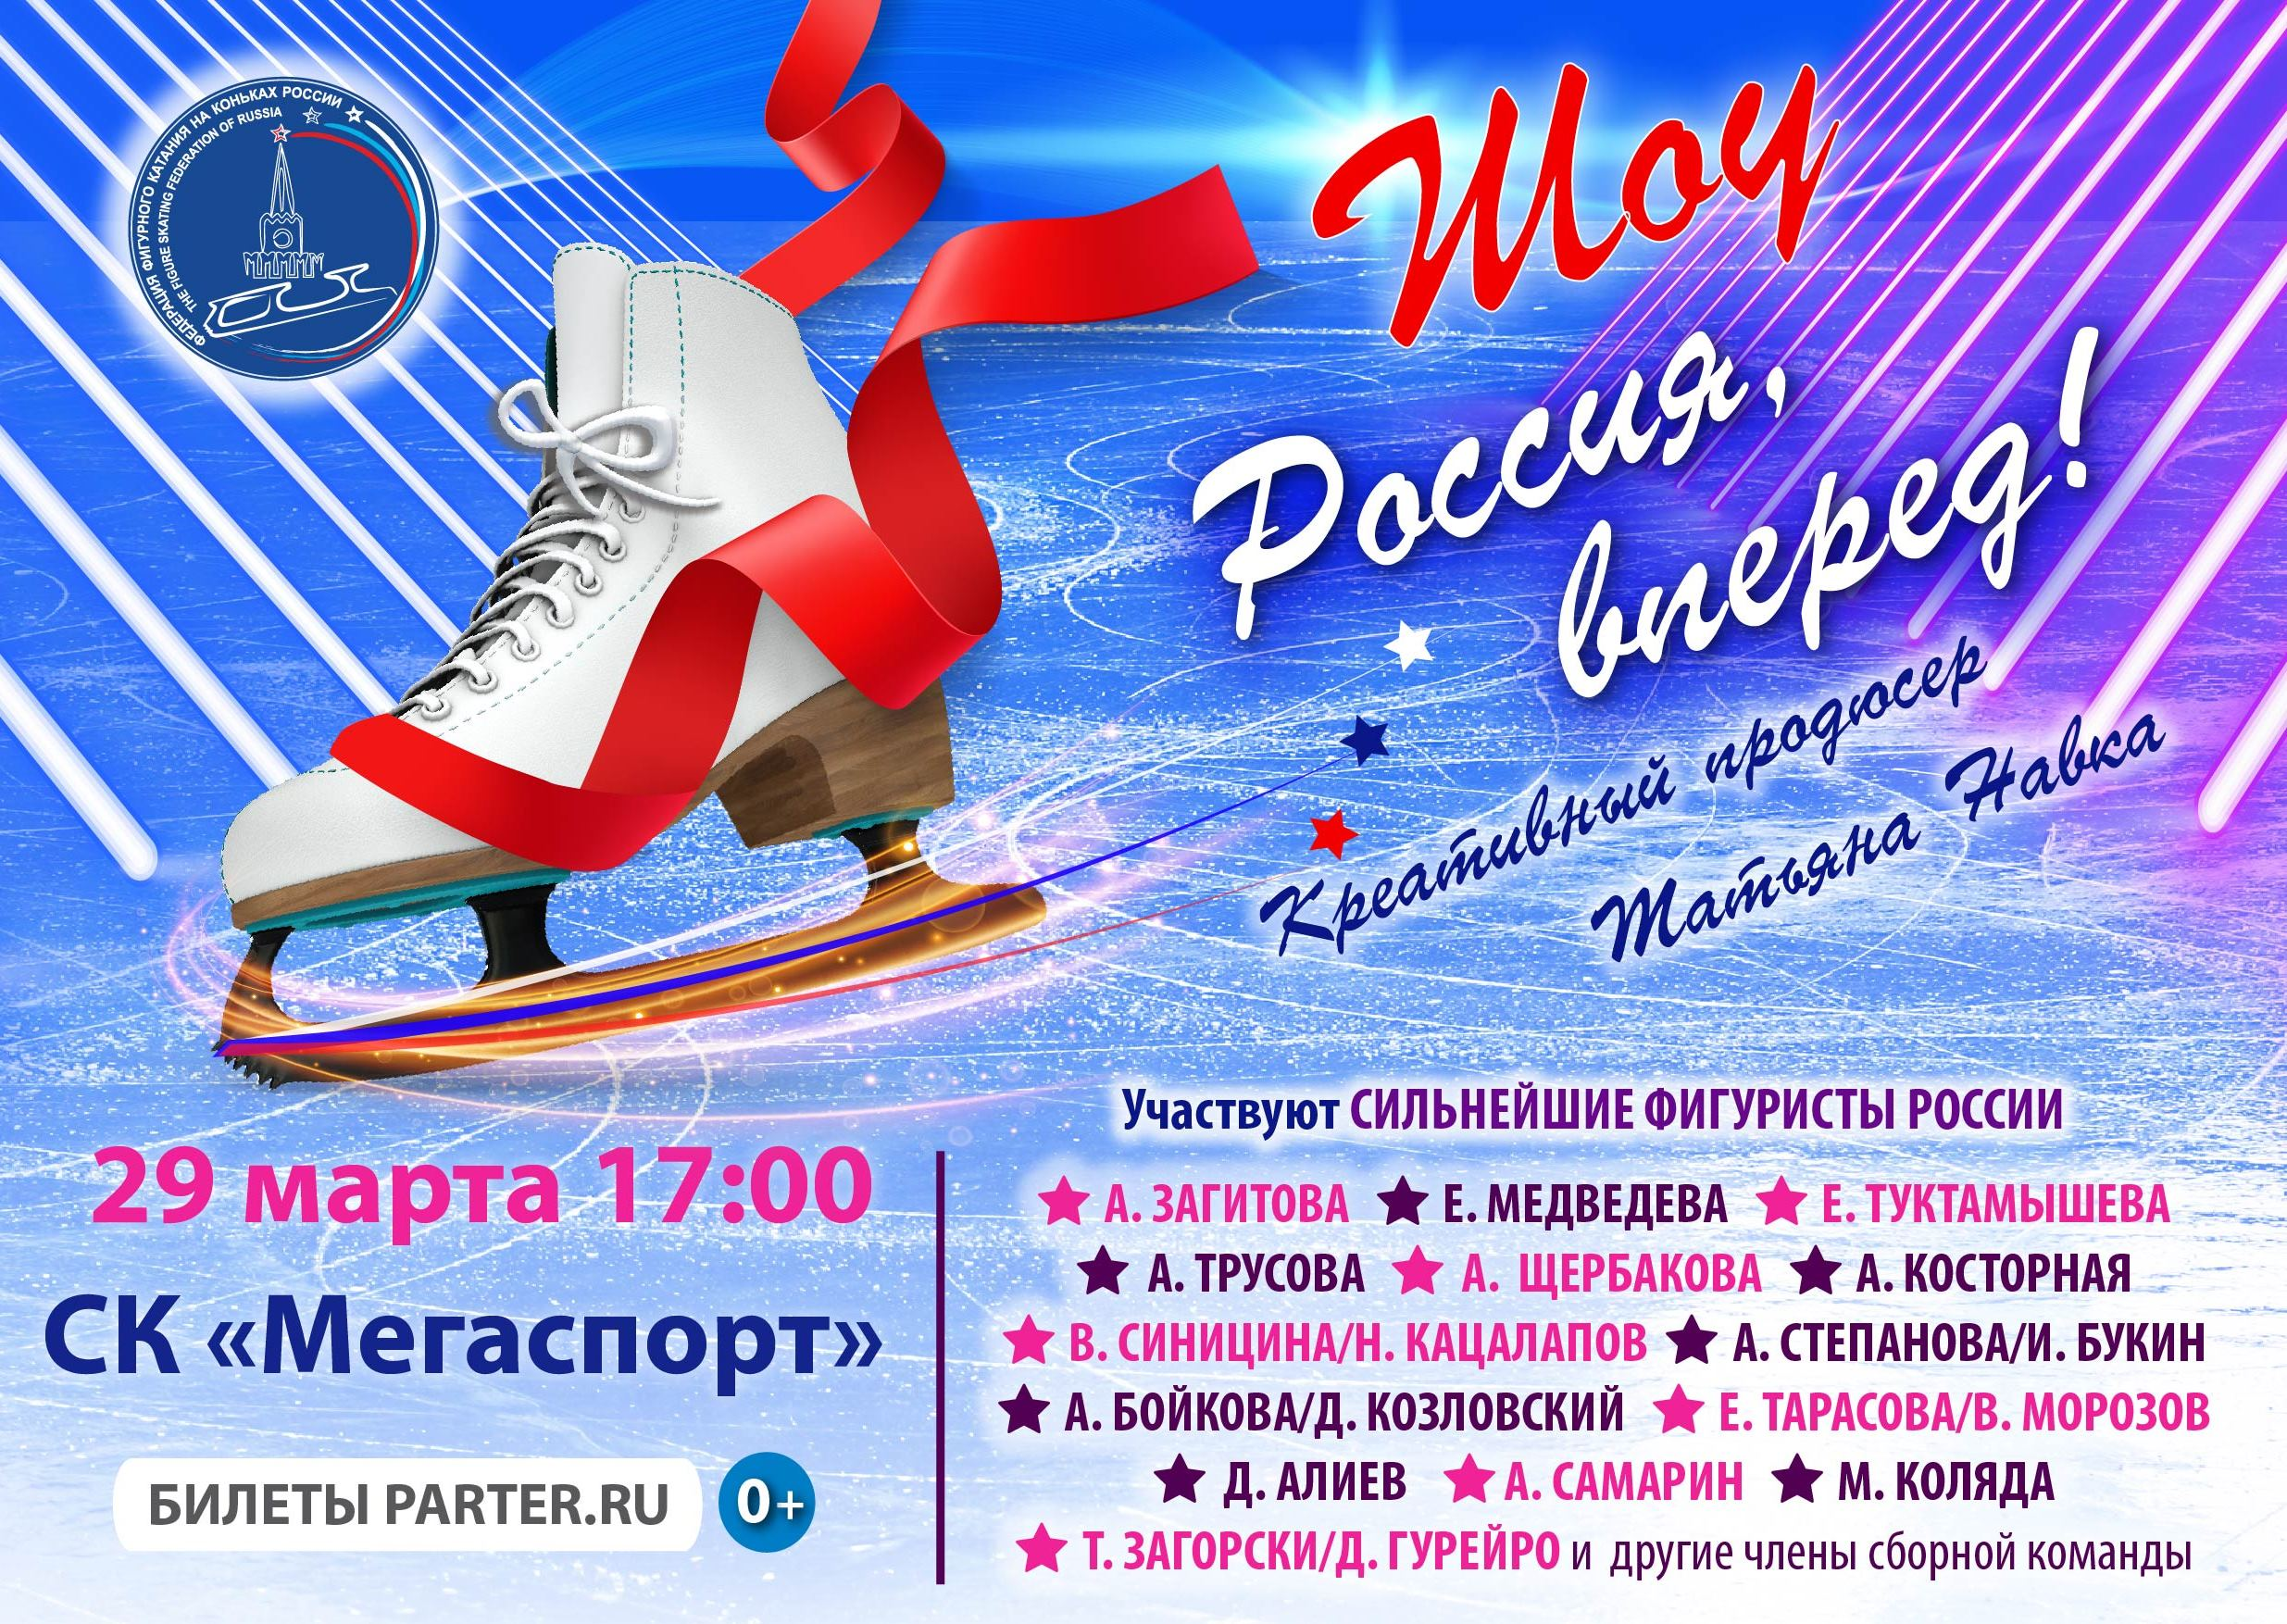 https://fsrussia.ru/images/competiton/show_russia_forward_03_2020.jpg